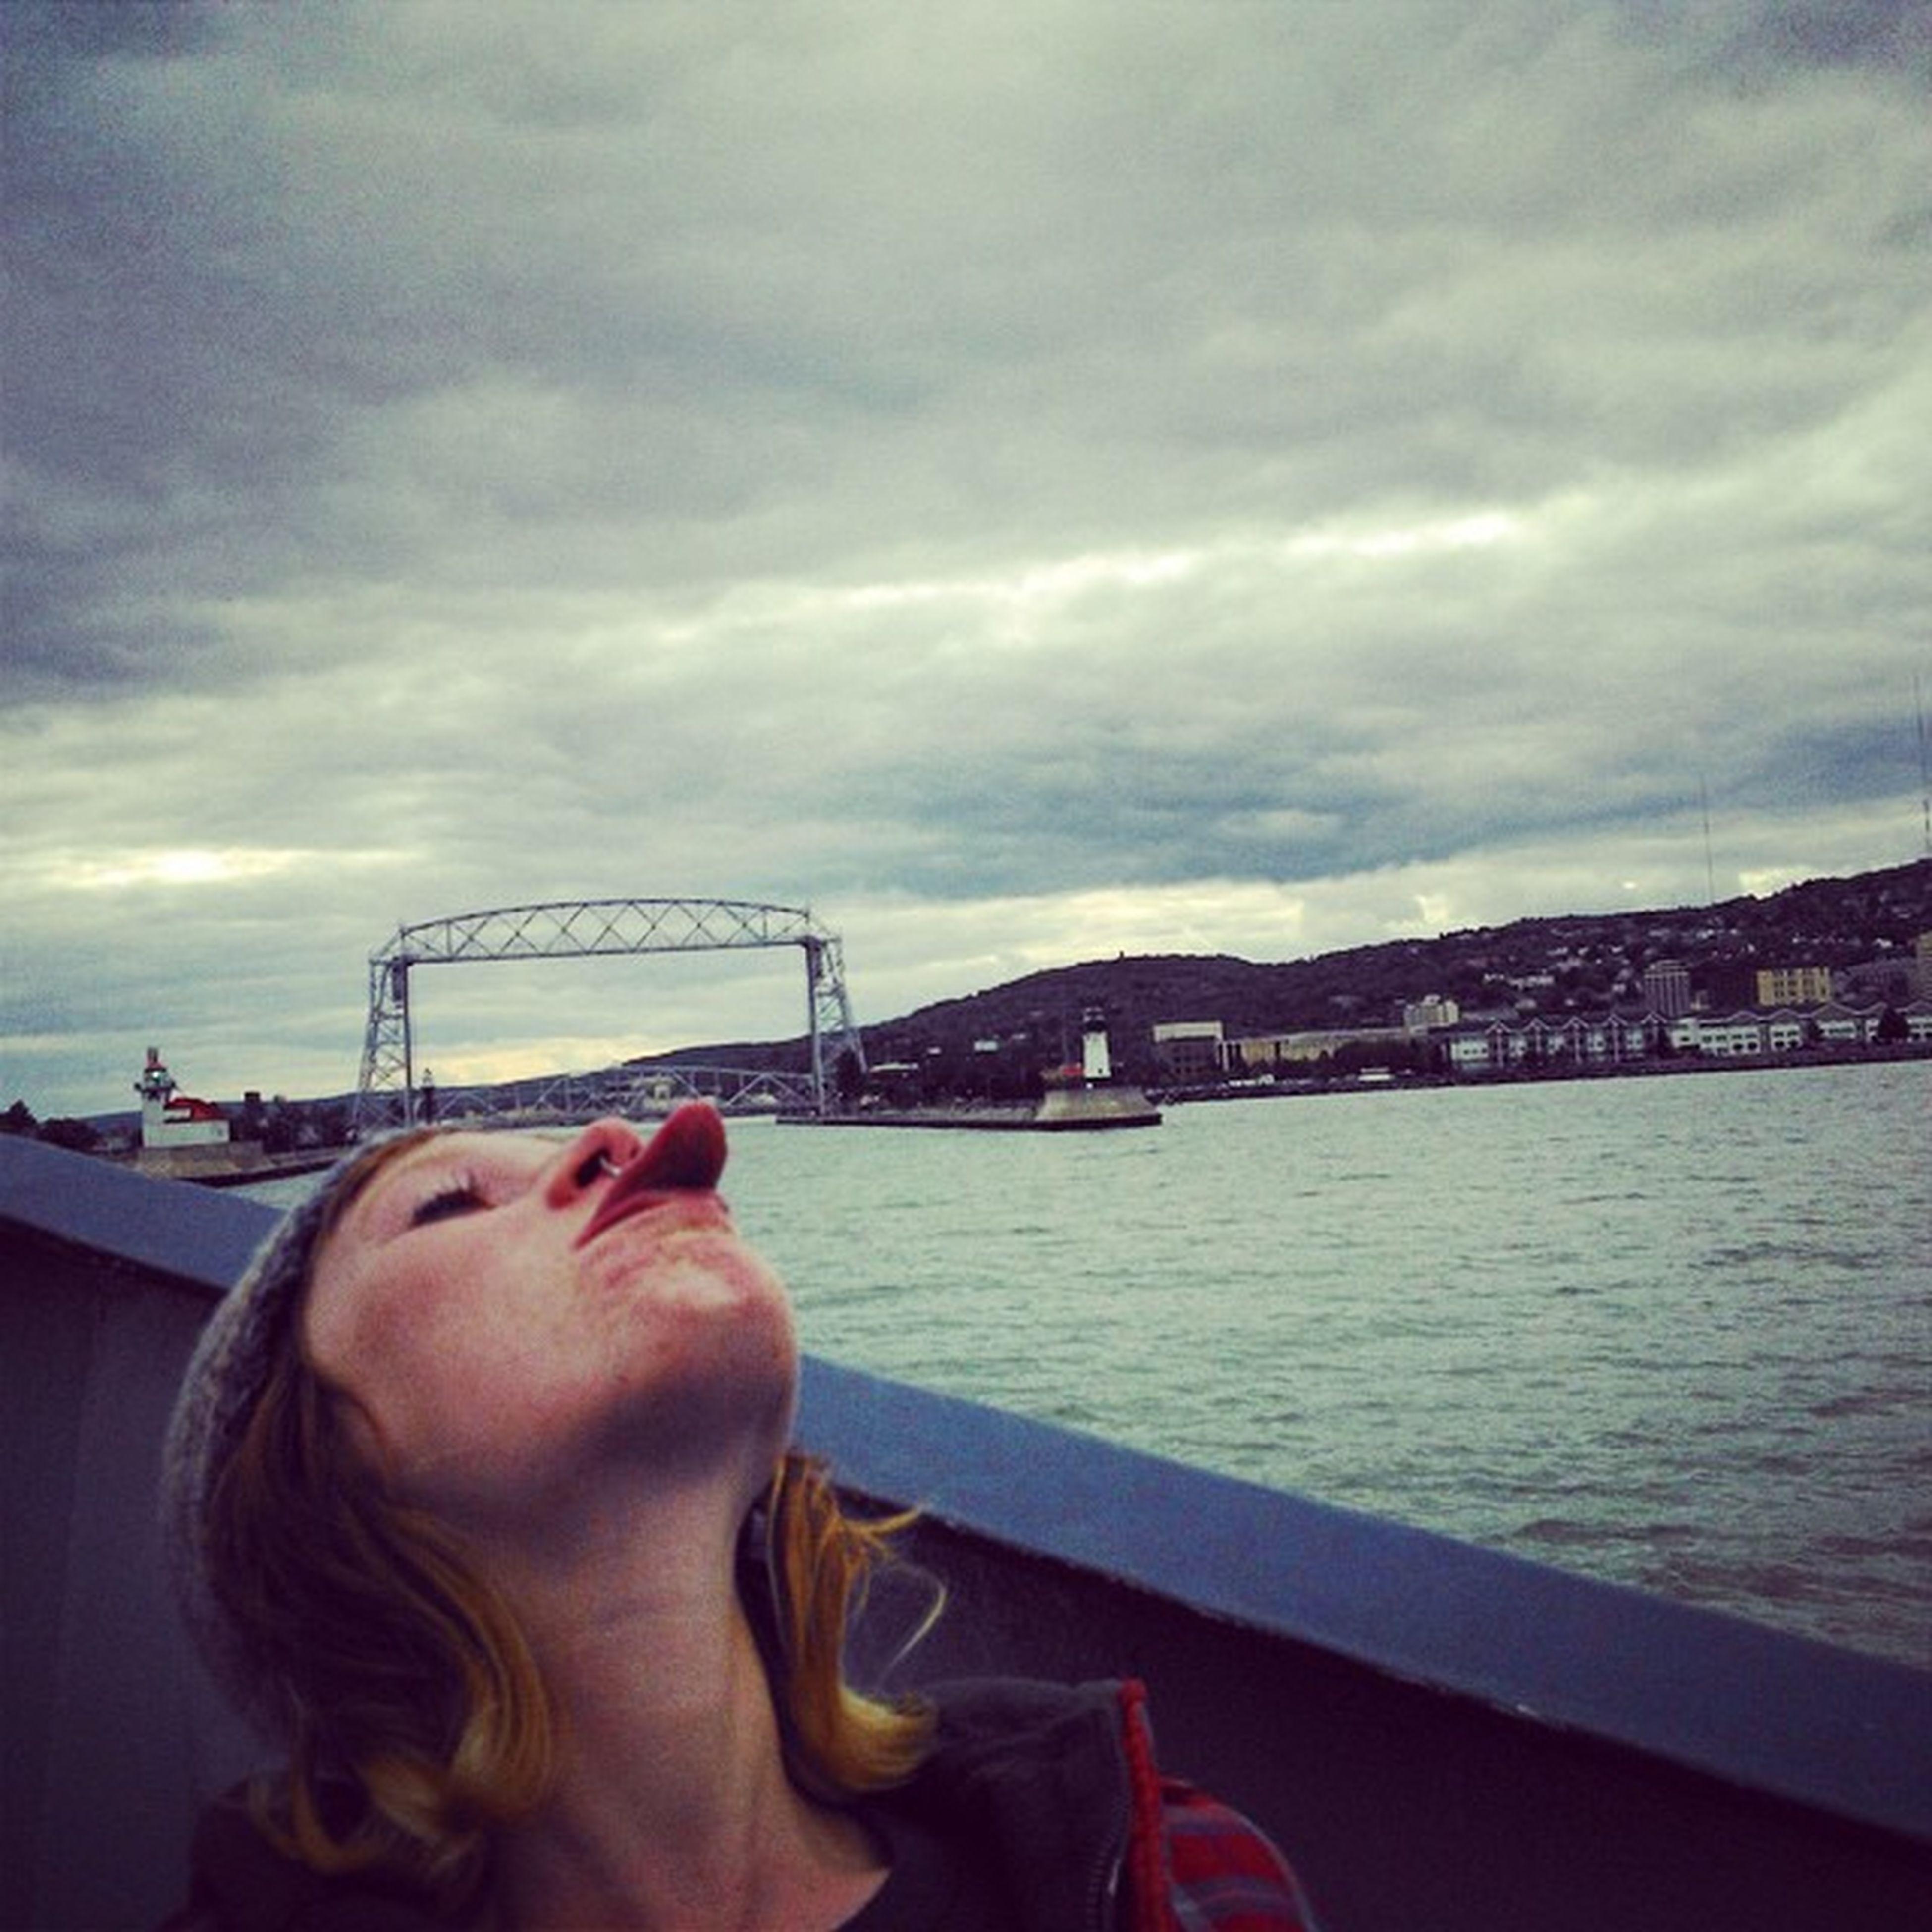 I'm on a boat! Seismicshit Geophyzz Checkoutthattoungue